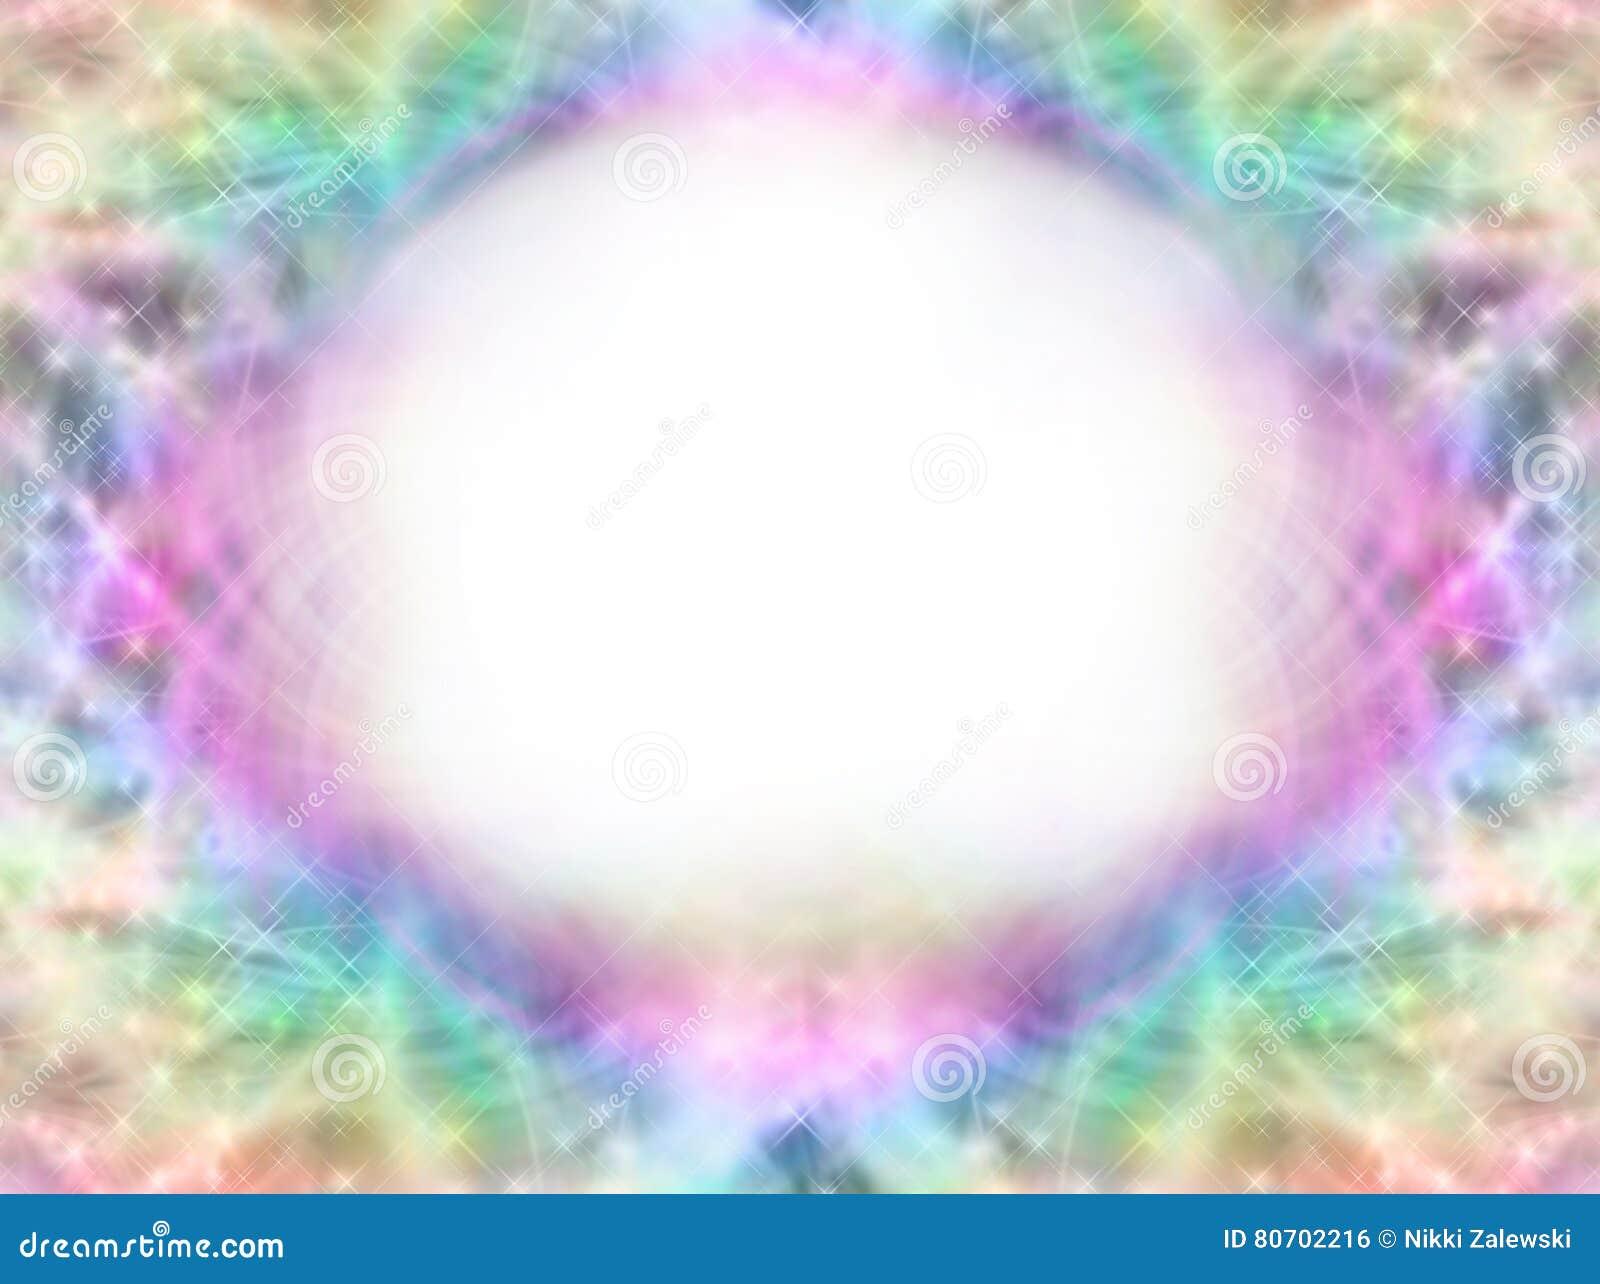 Magical Symmetrical Frame